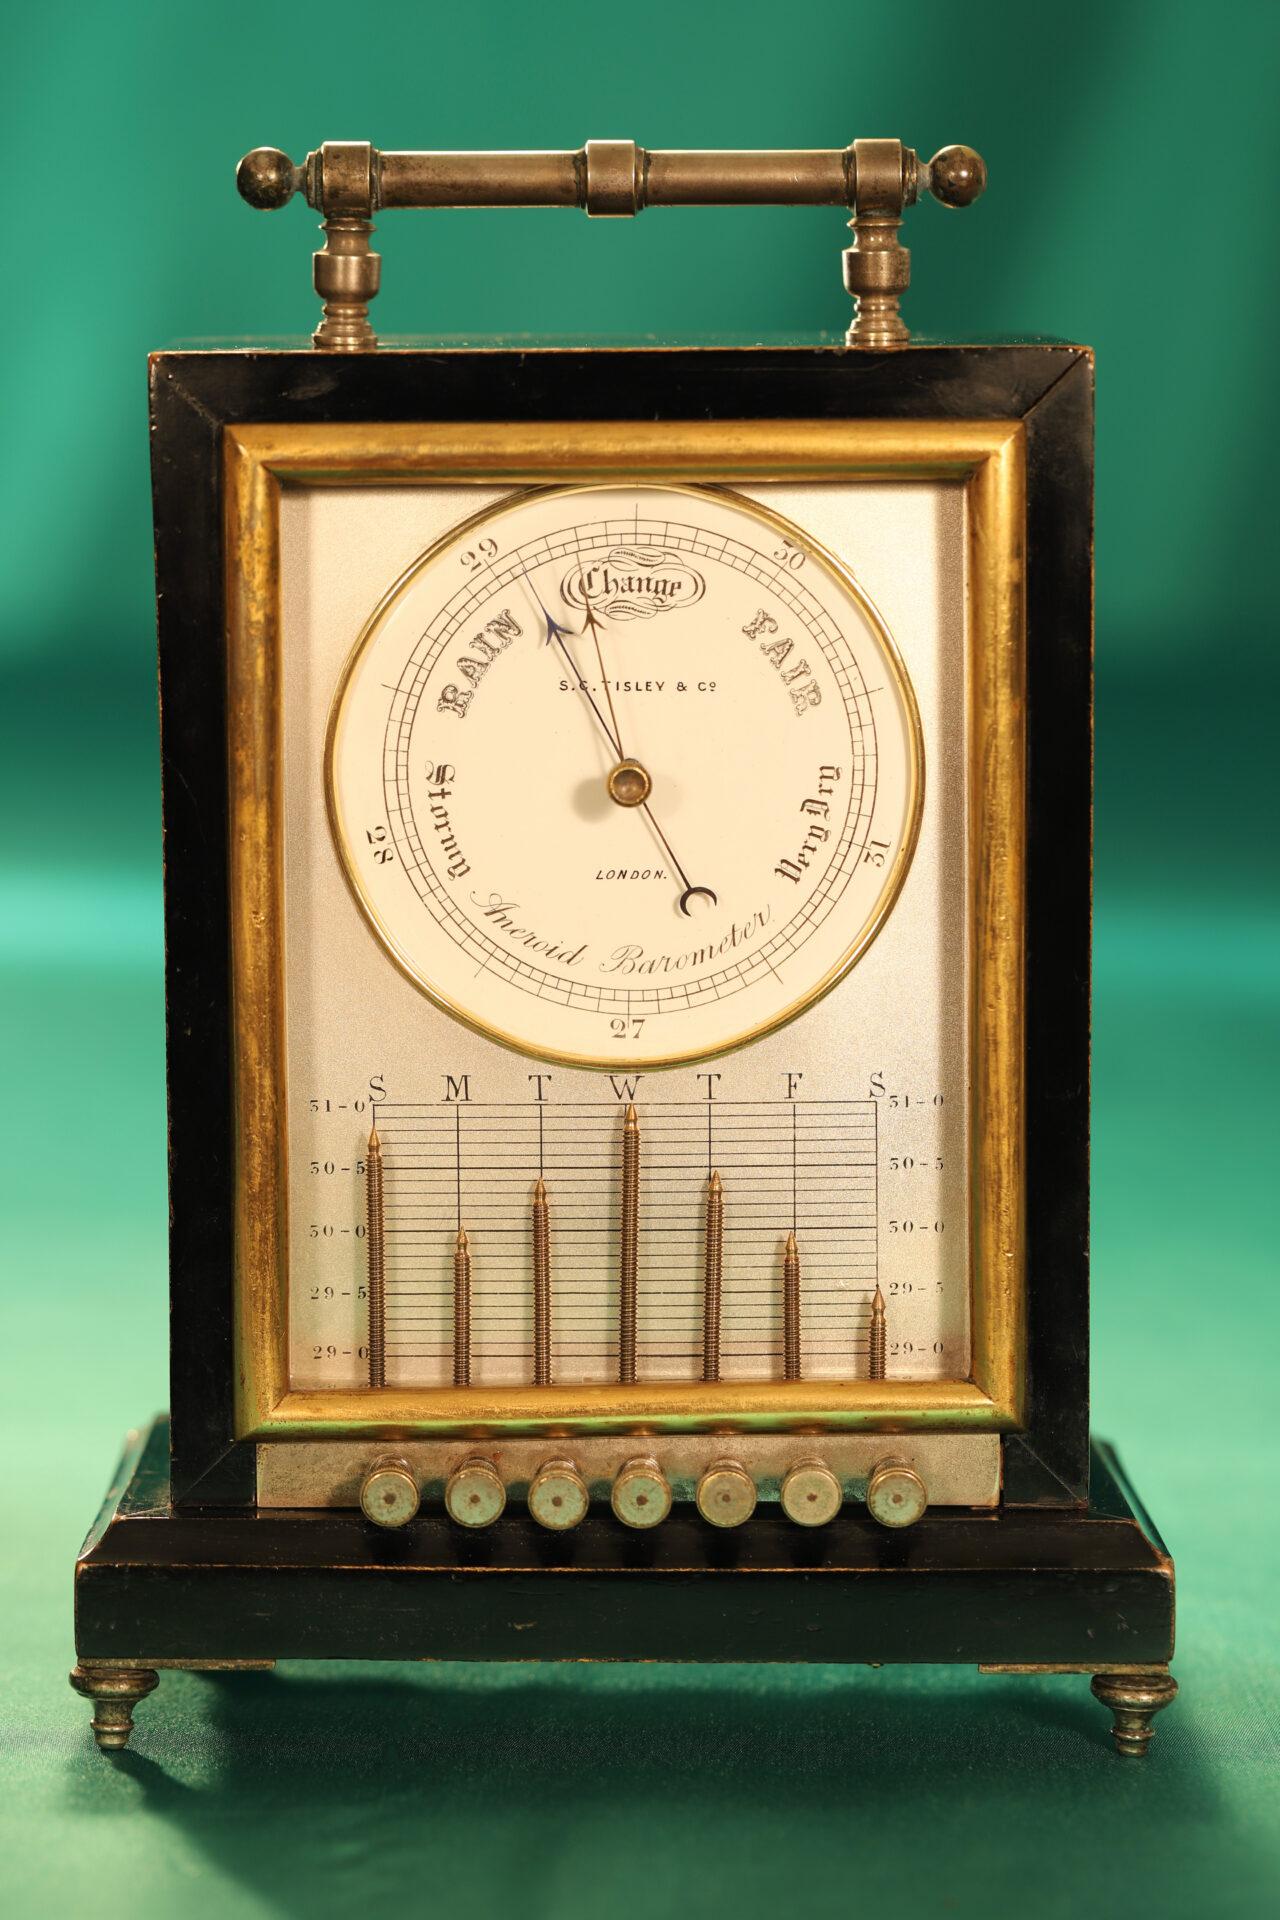 Image of Ebonised Recording Aneroid Barometer or Barograph c1878 c1860